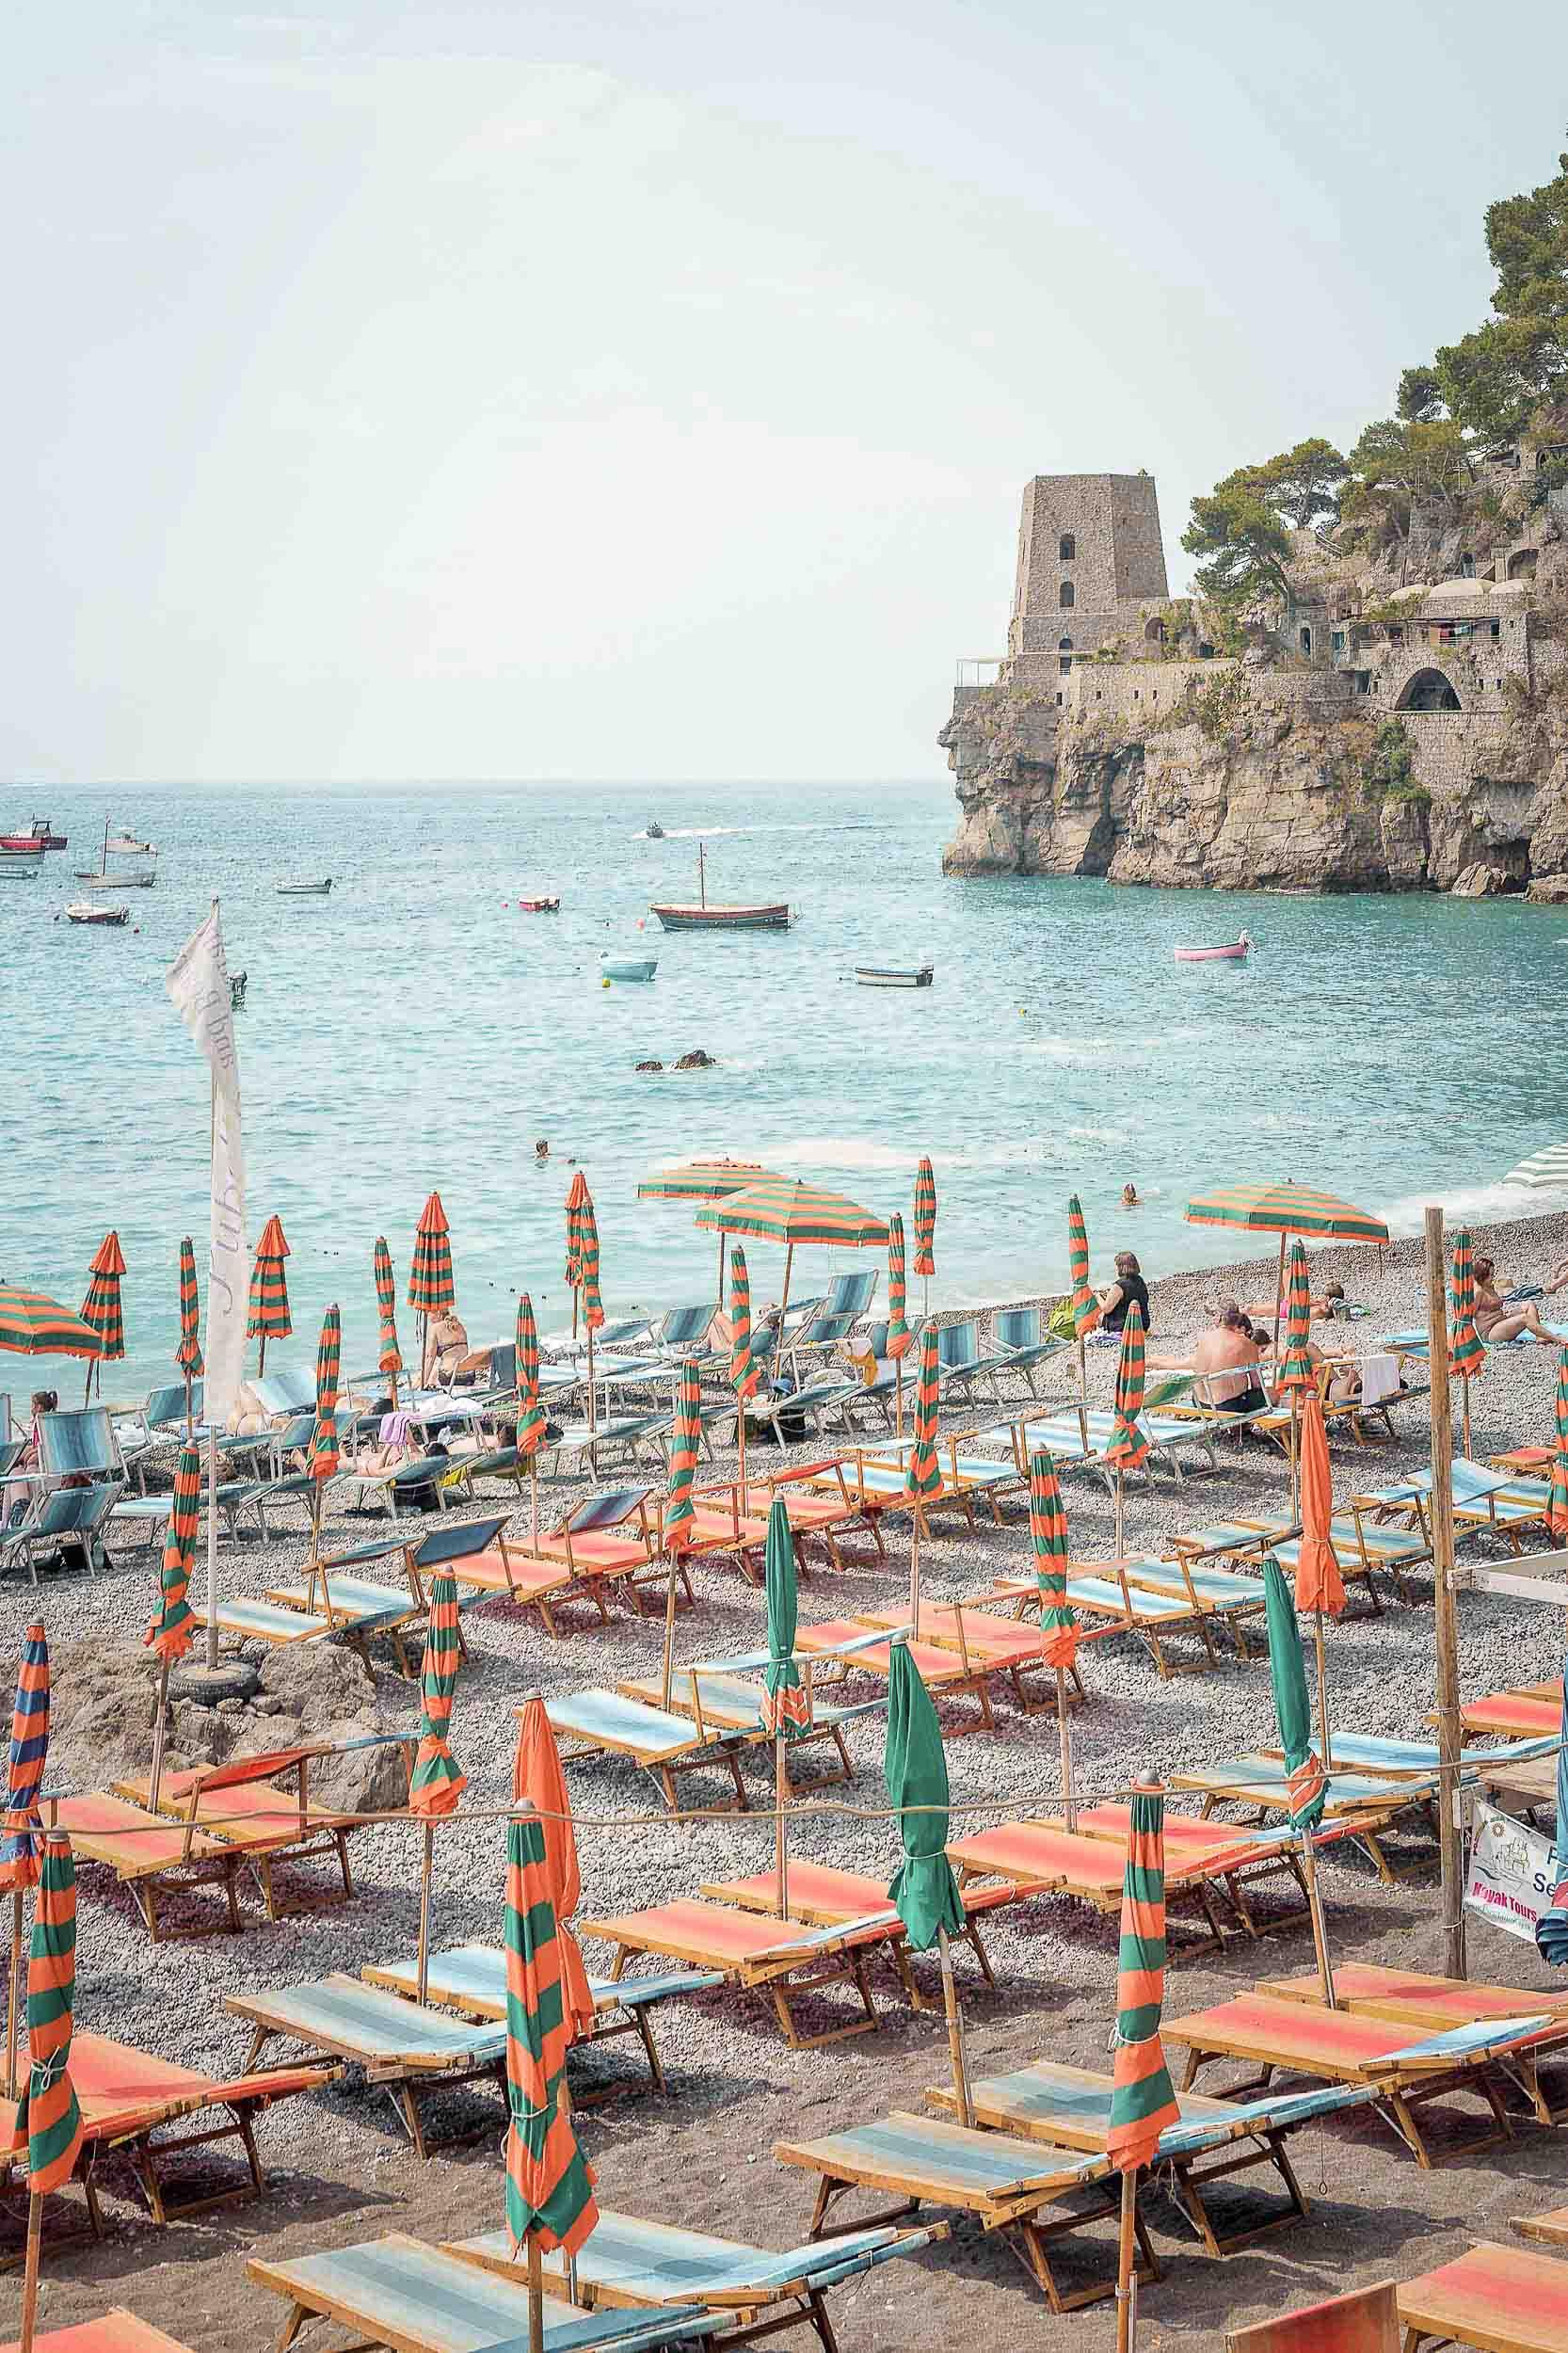 A less touristy Amalfi Coast beaches option, Fornillo Beach in Positano